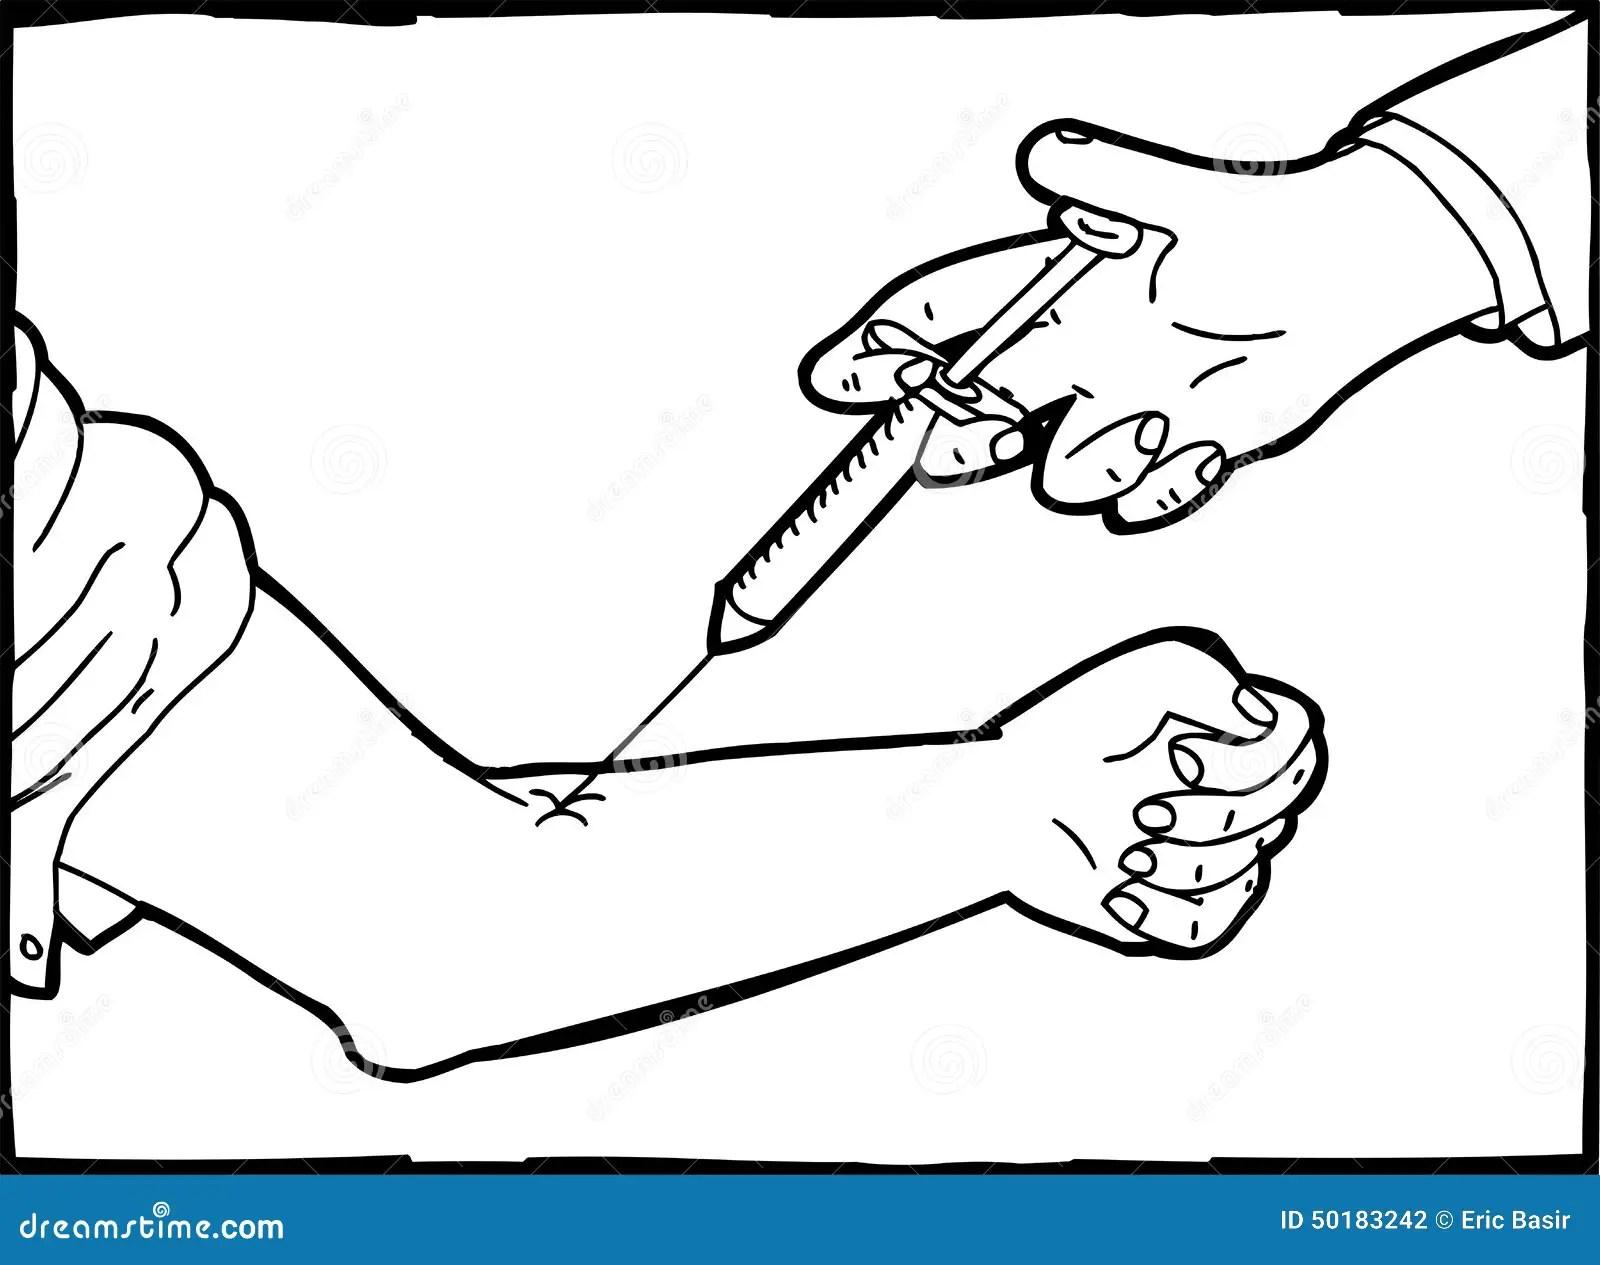 Blood Draw Needle Cartoon